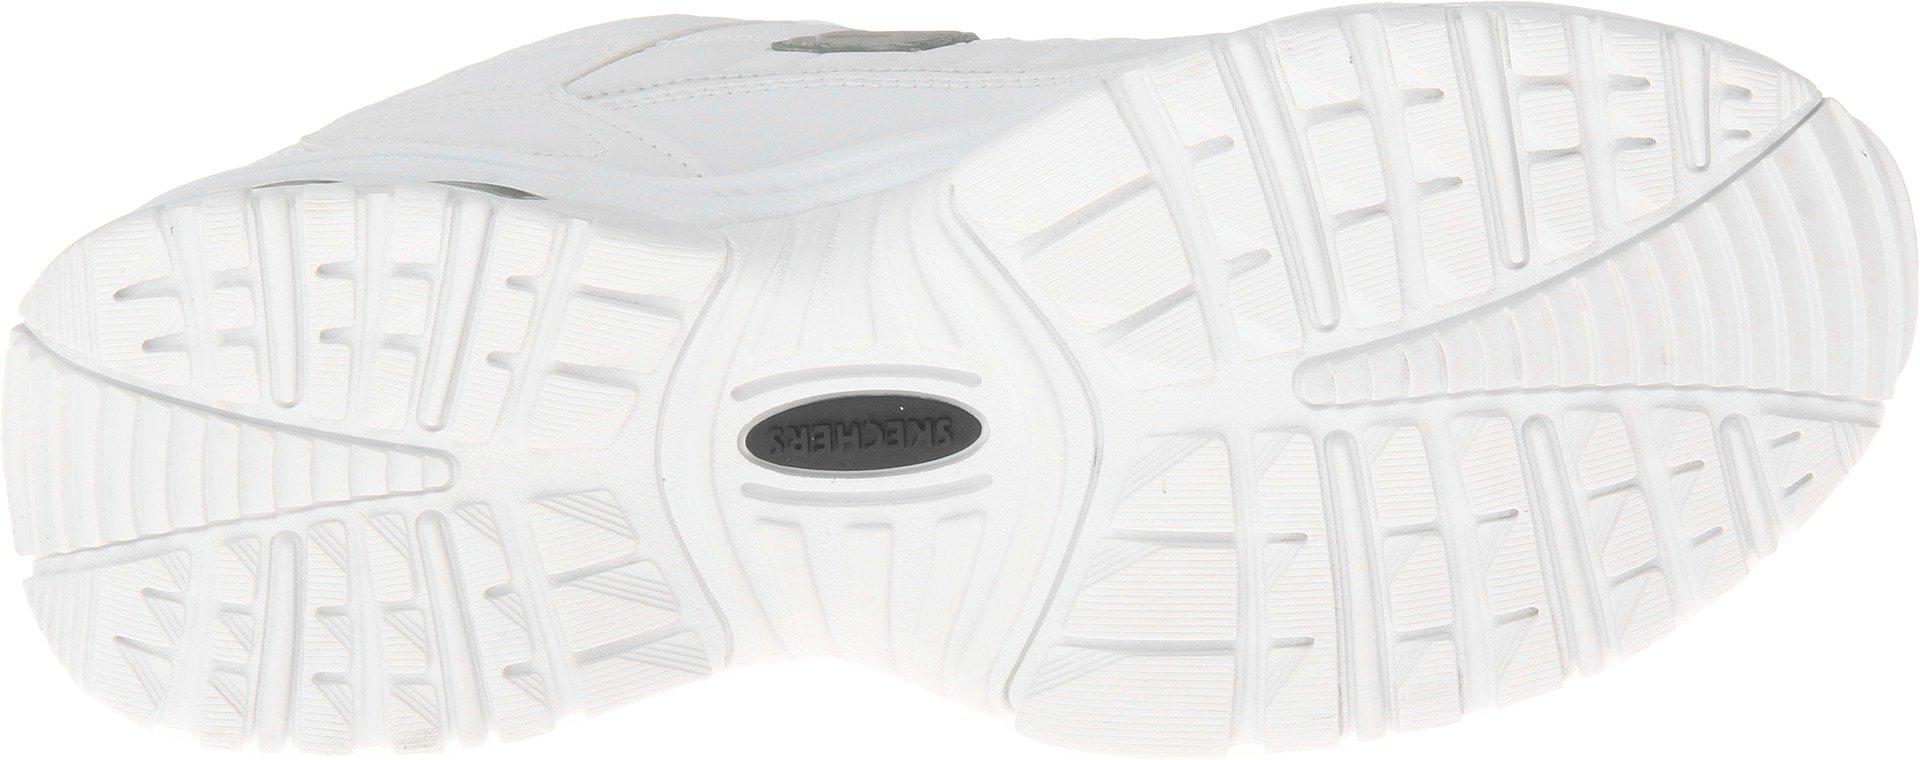 Skechers Men's Energy Afterburn Lace-Up Sneaker,White,8 M US by Skechers (Image #3)